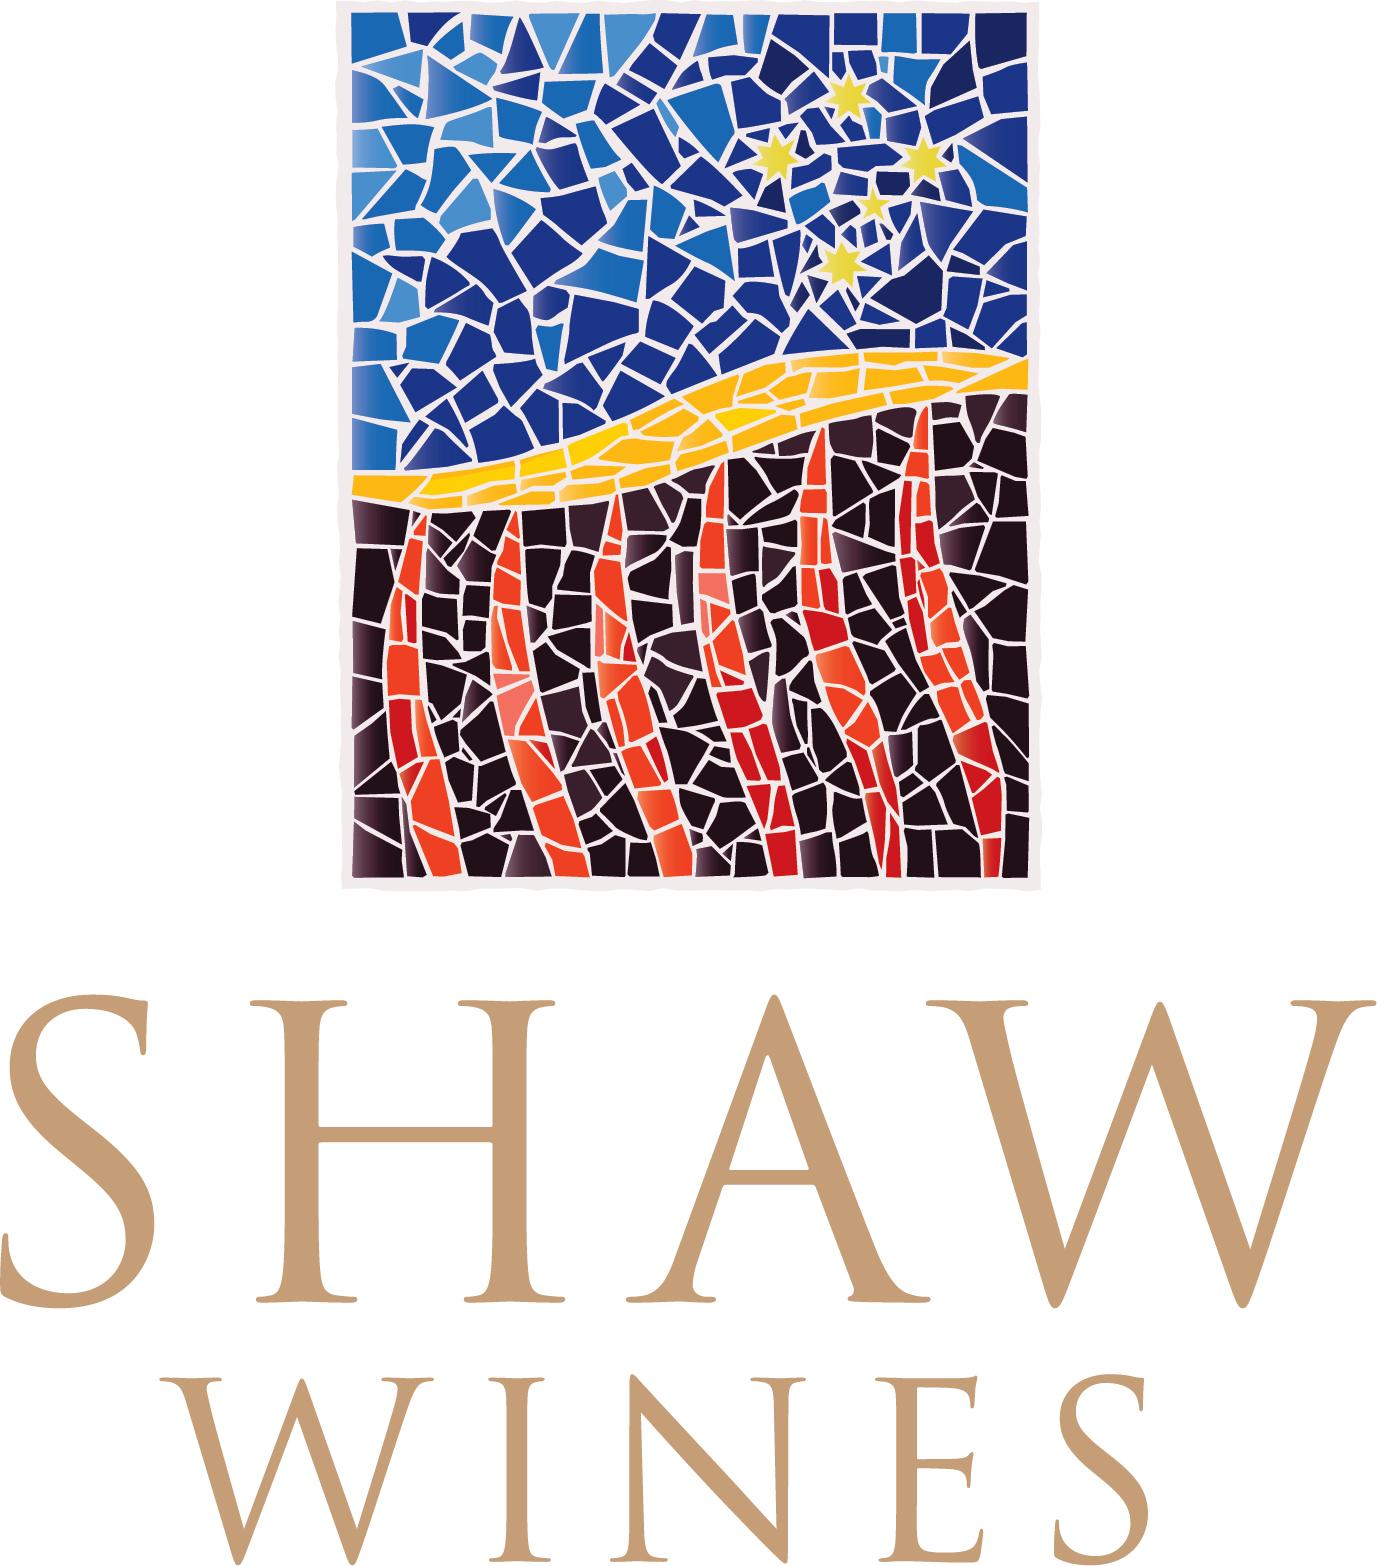 Shaw_Wines.jpg